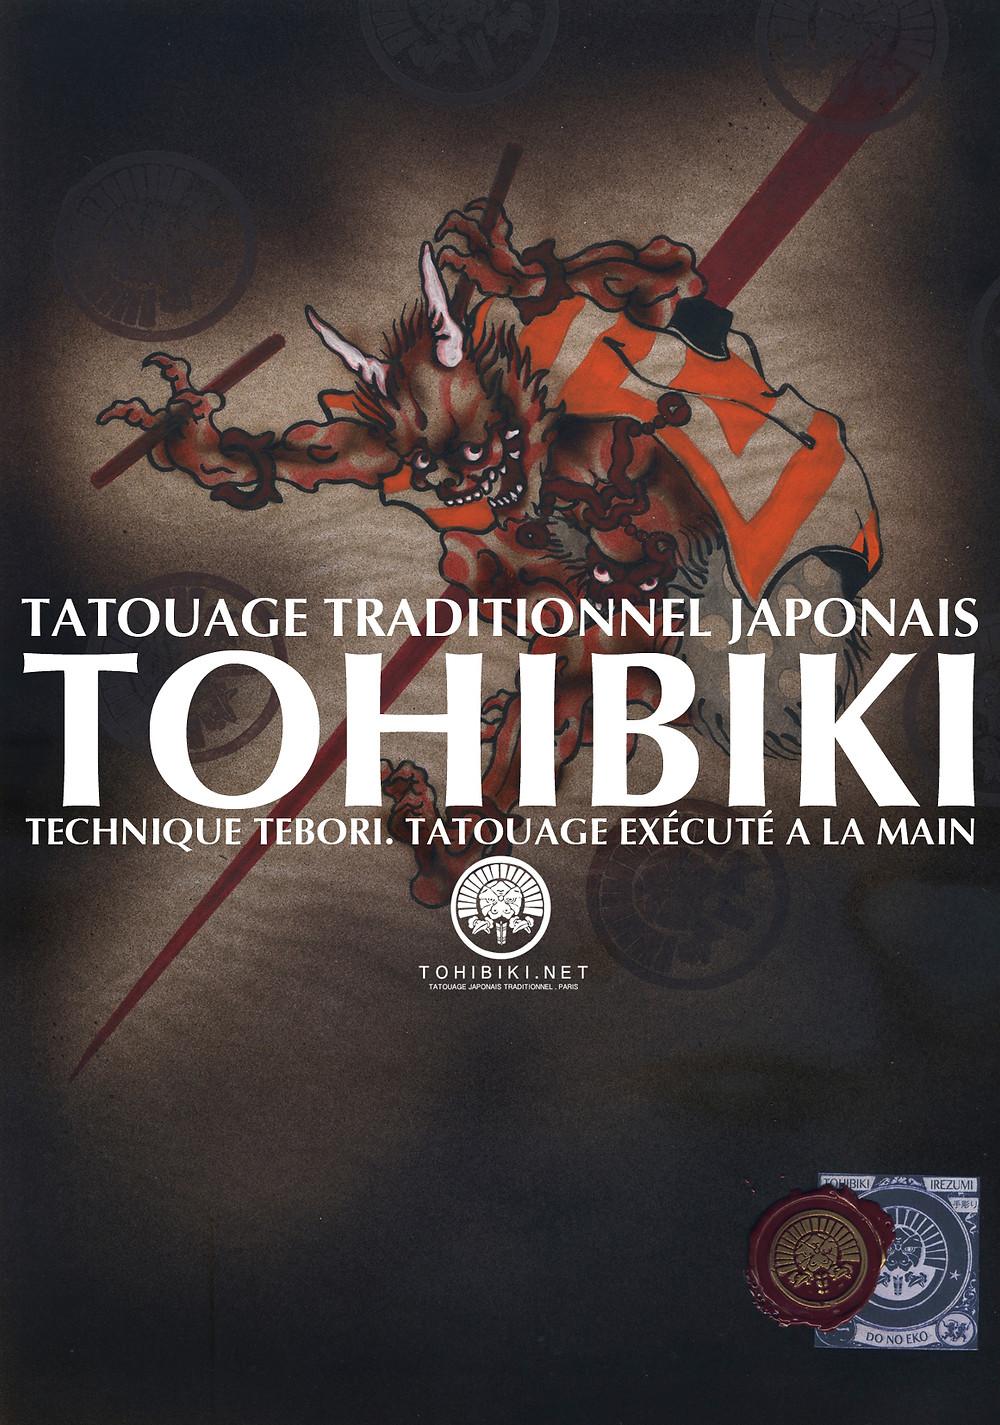 Hottoys Predator Samurai by Kuroi Tohibiki. Hot Toys Samurai Predator. IREZUMI, Paris.